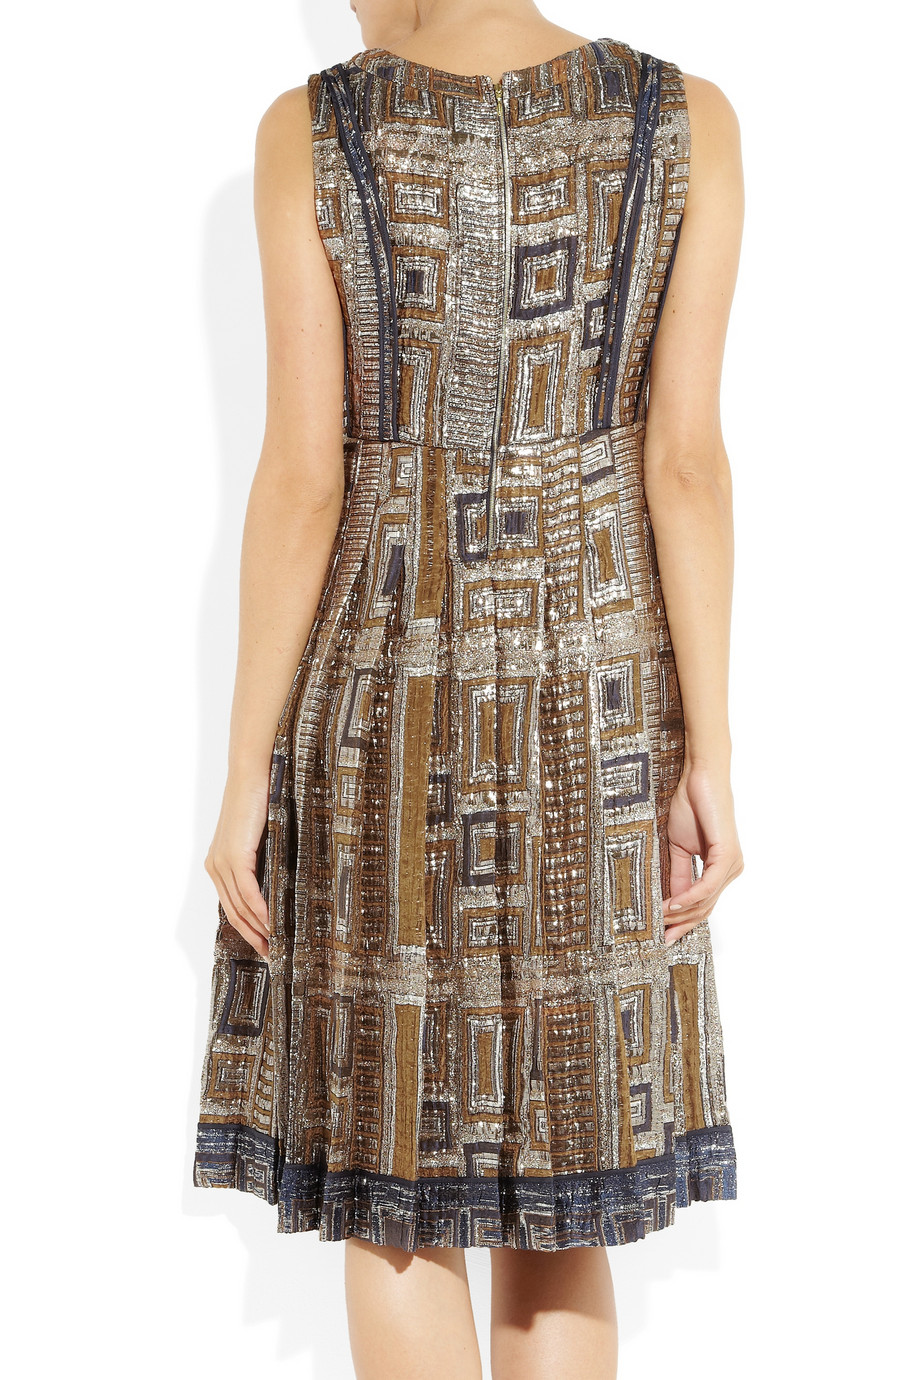 Rochas Silk Metallic Brocade Dress In Light Brown Blue